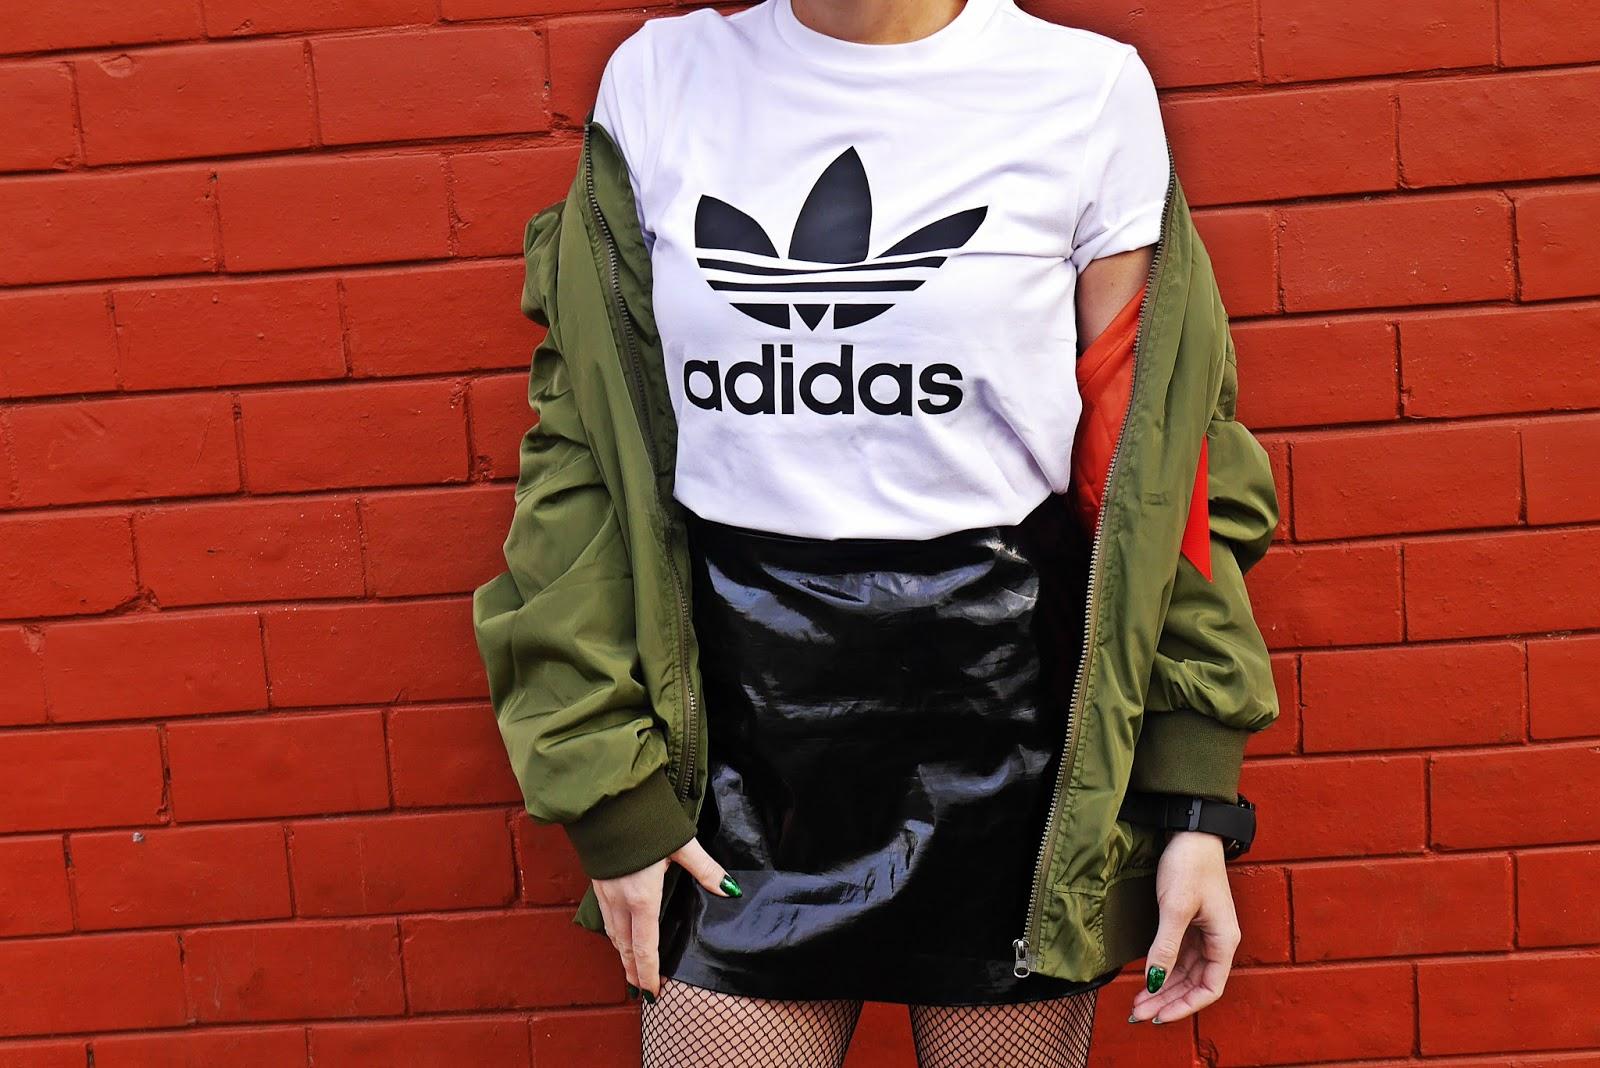 8_zielona_oversize_bomberka_top_adidas_biale_botki_renee_karyn_blog_modowy_080318awe